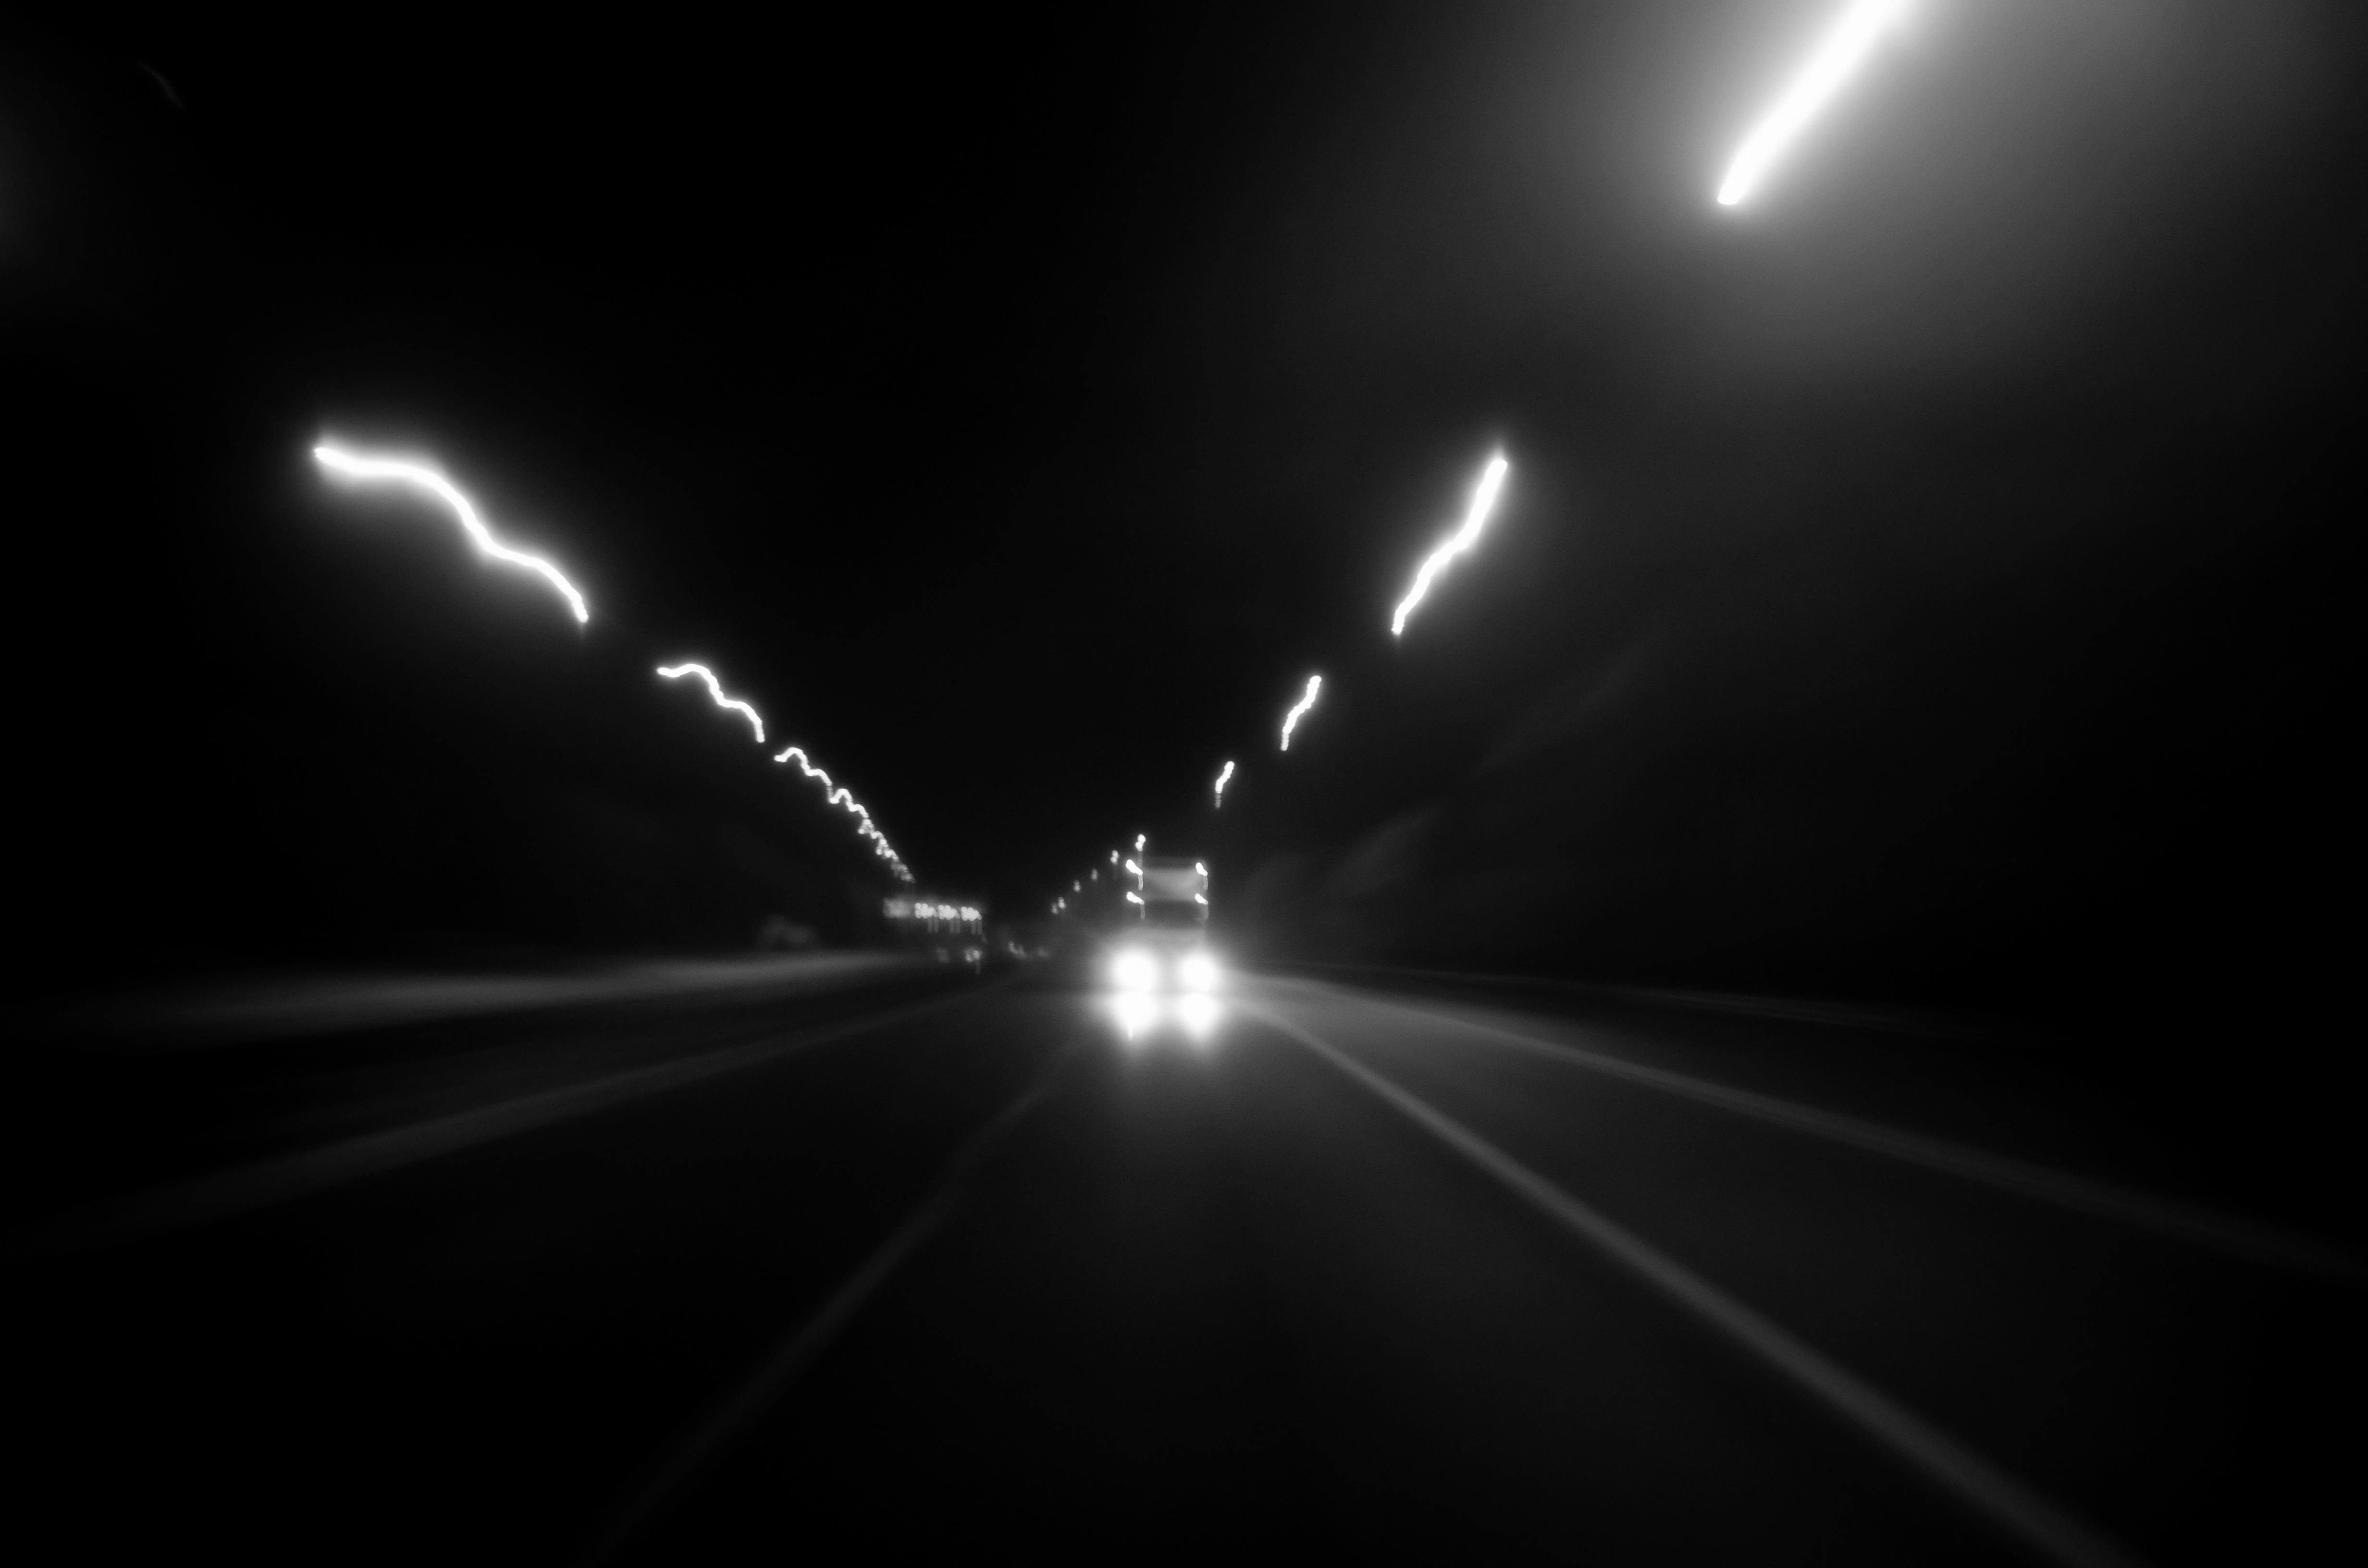 Wallpaper Landscape Contrast Street Light Dark City